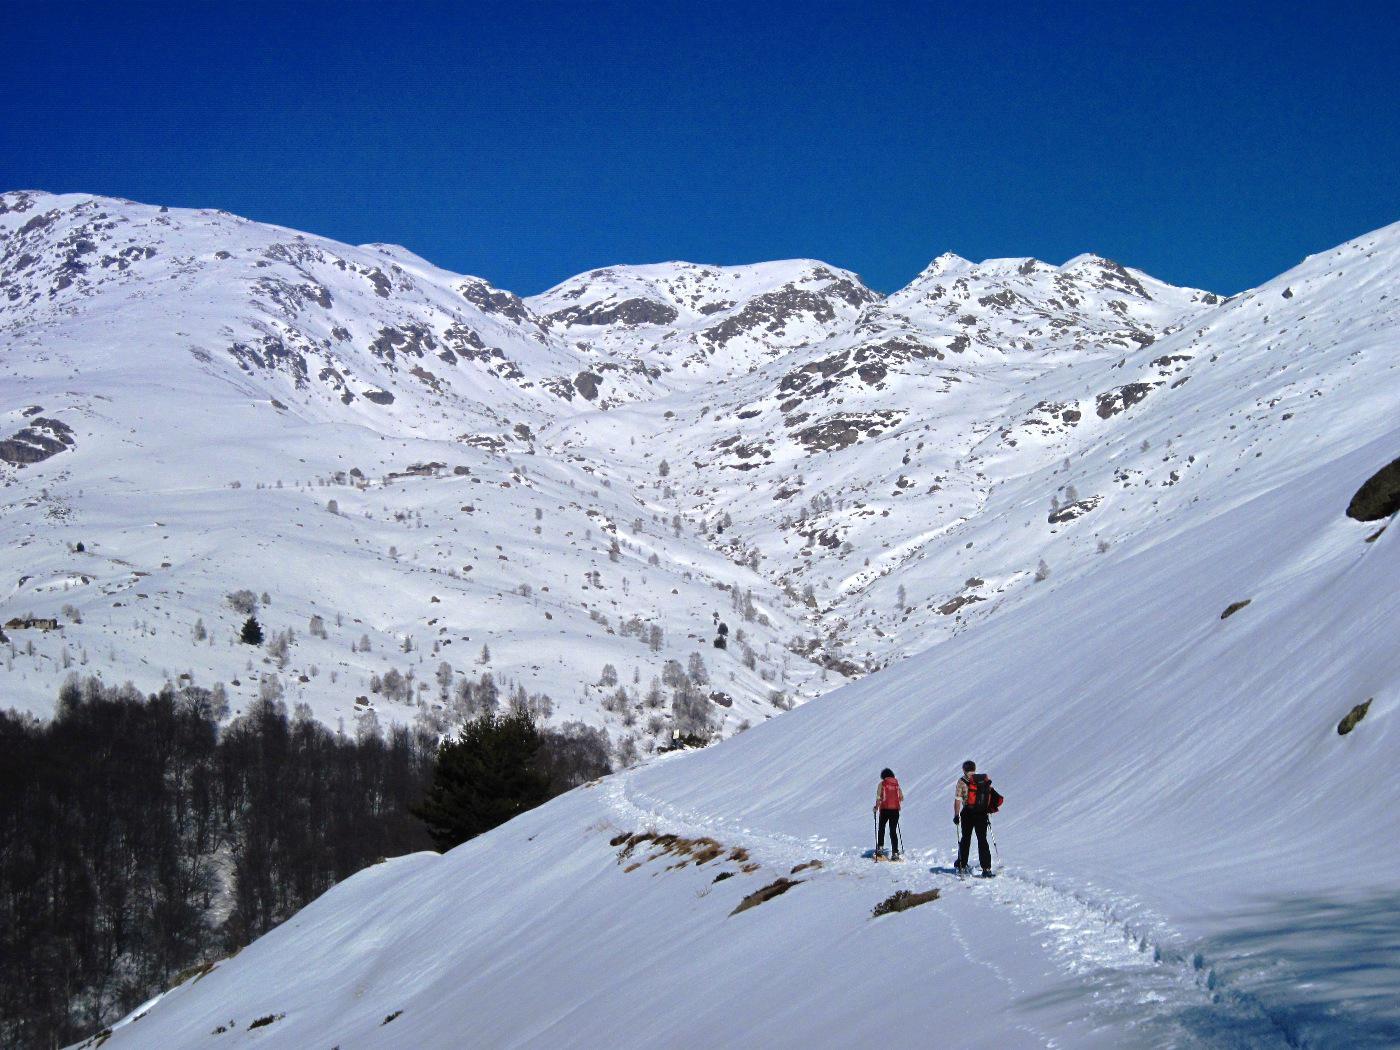 Verso l'Alpe Cavanna